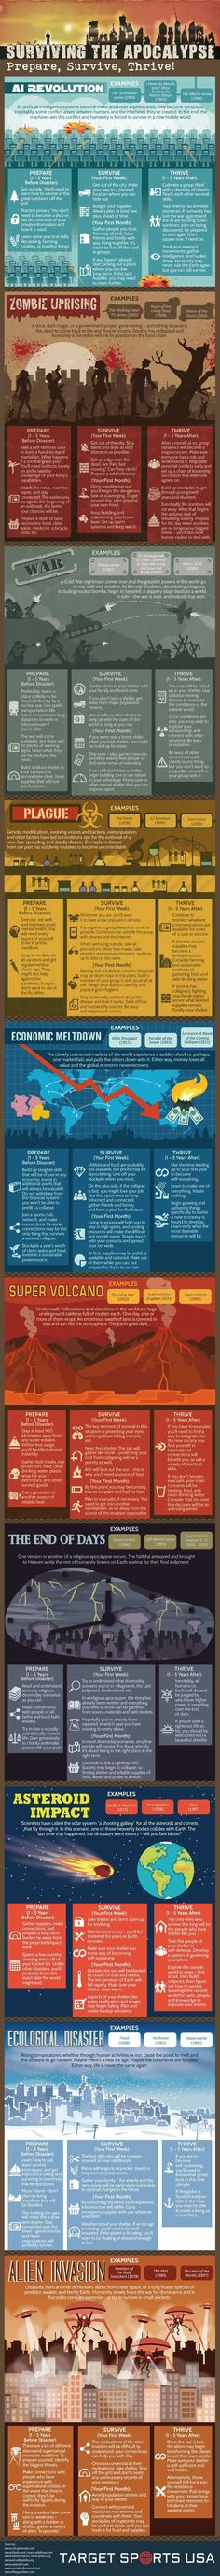 Surviving the Apocalypse: Prepare, Survive, Thrive! #Infographic #ScienceFiction